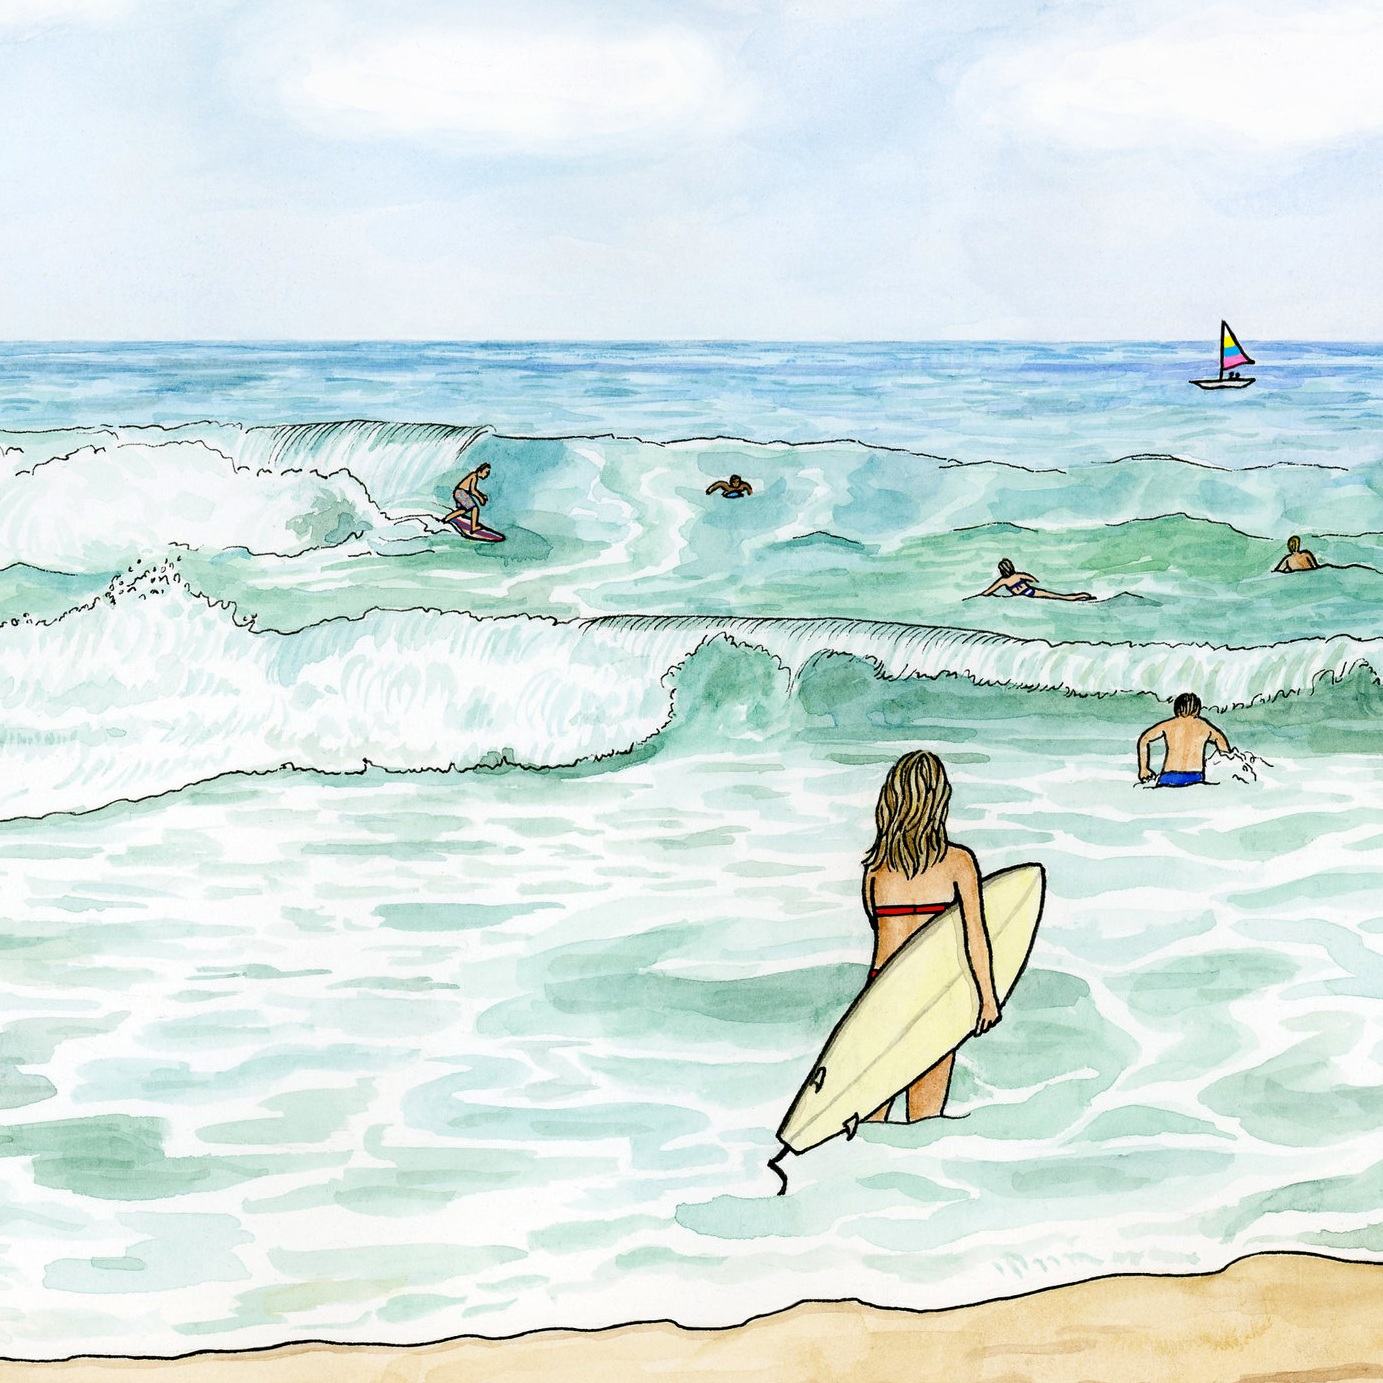 Bumble and bumble: Beach